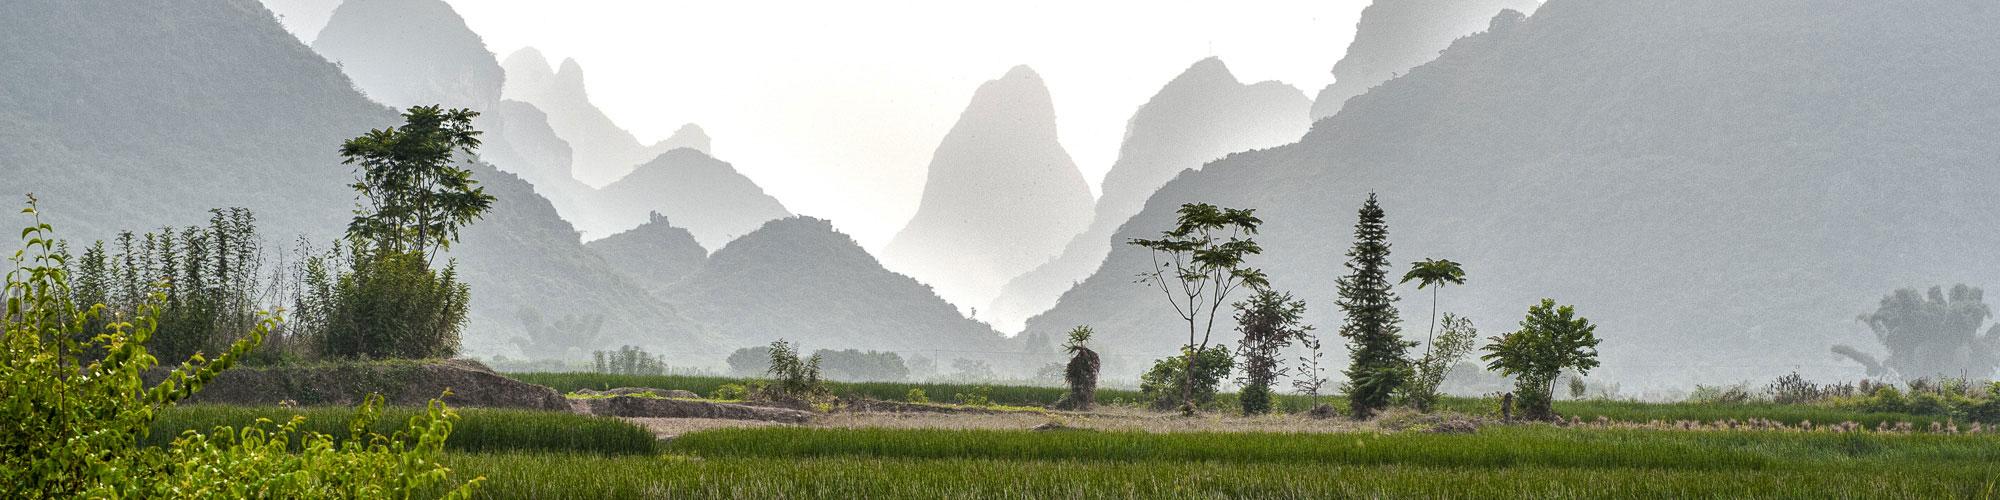 ©Charles Borsboom - Yangshuo